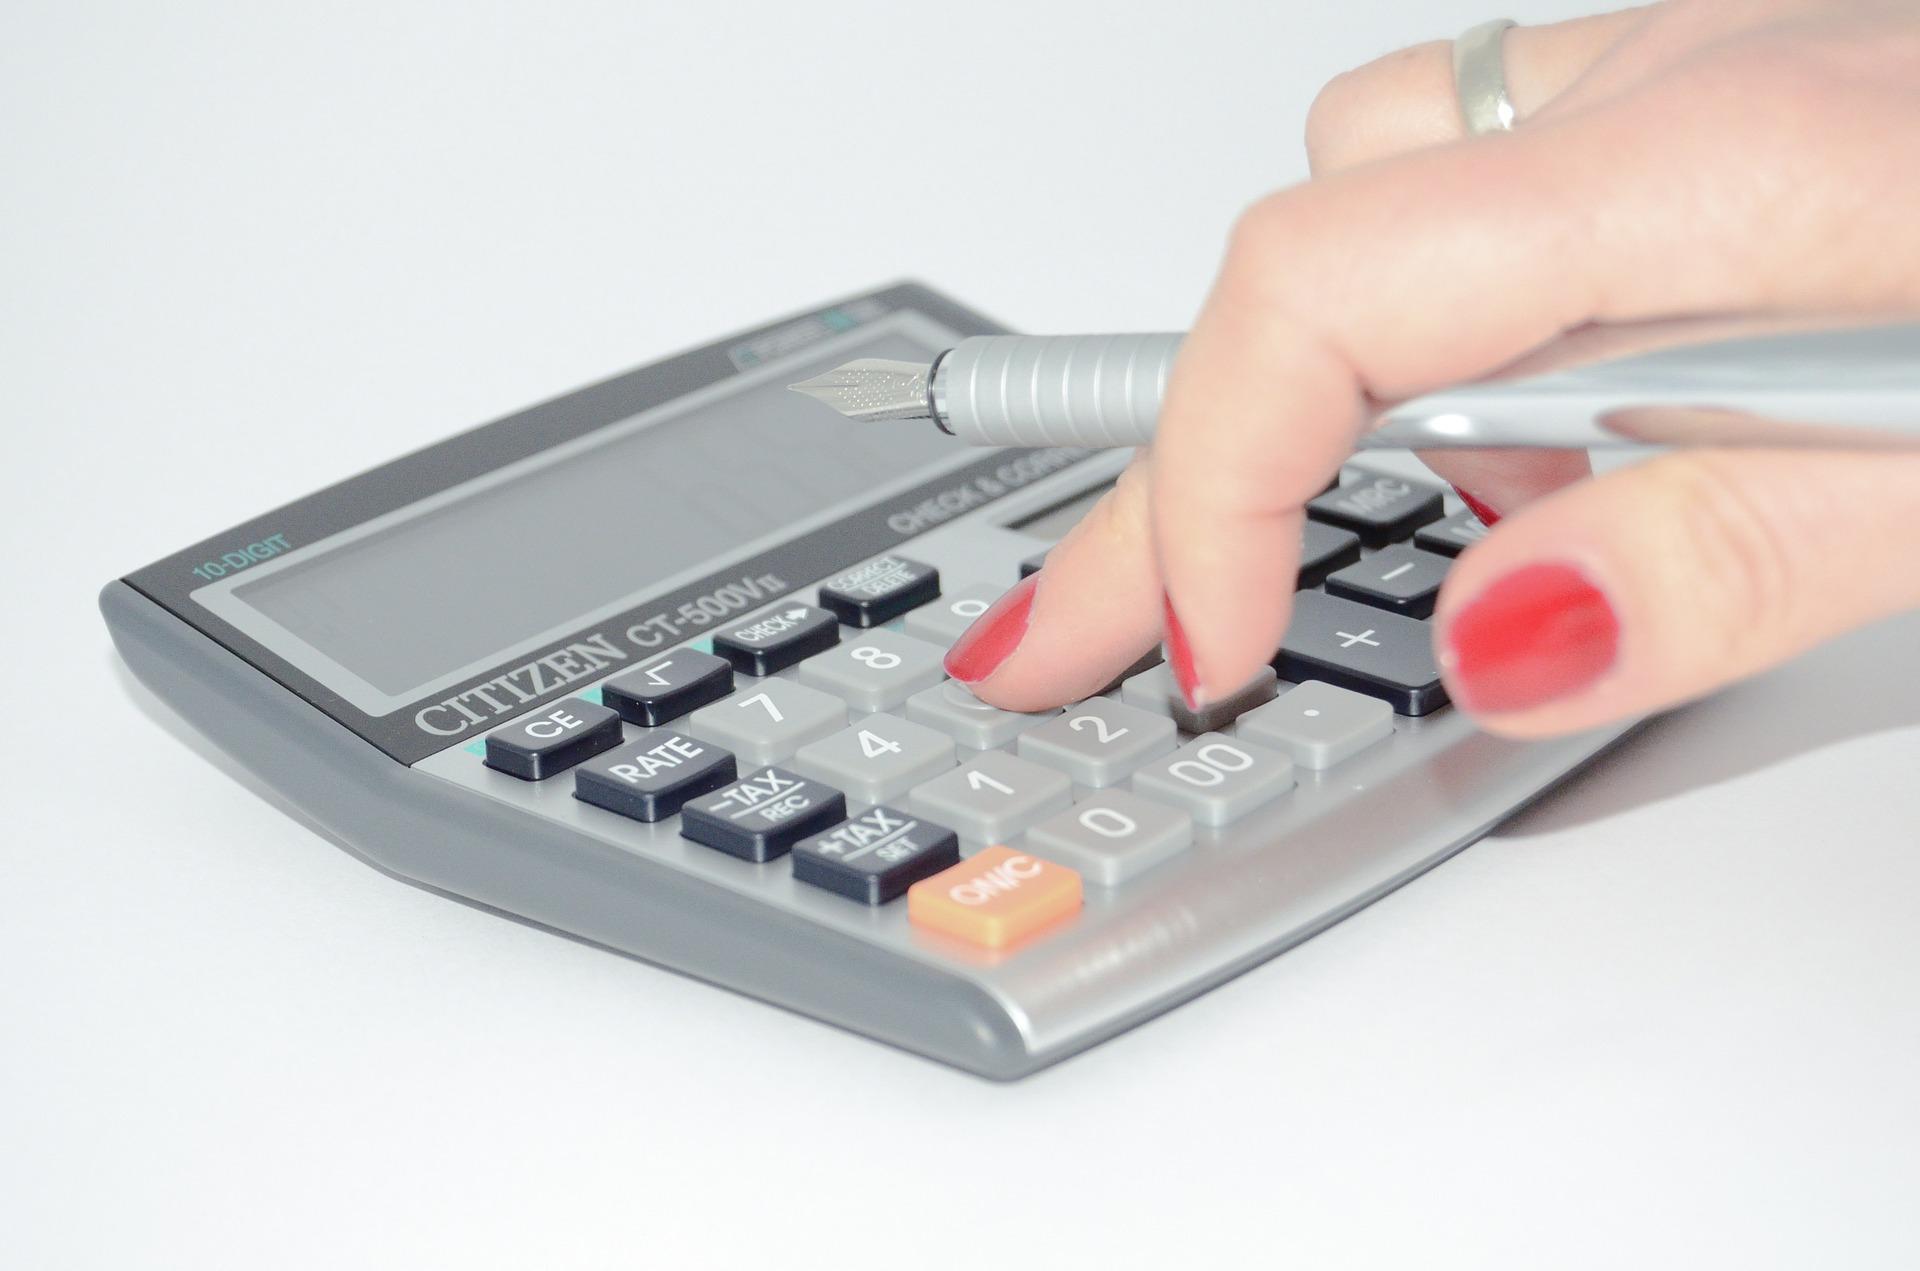 Erhebung der Sexsteuer